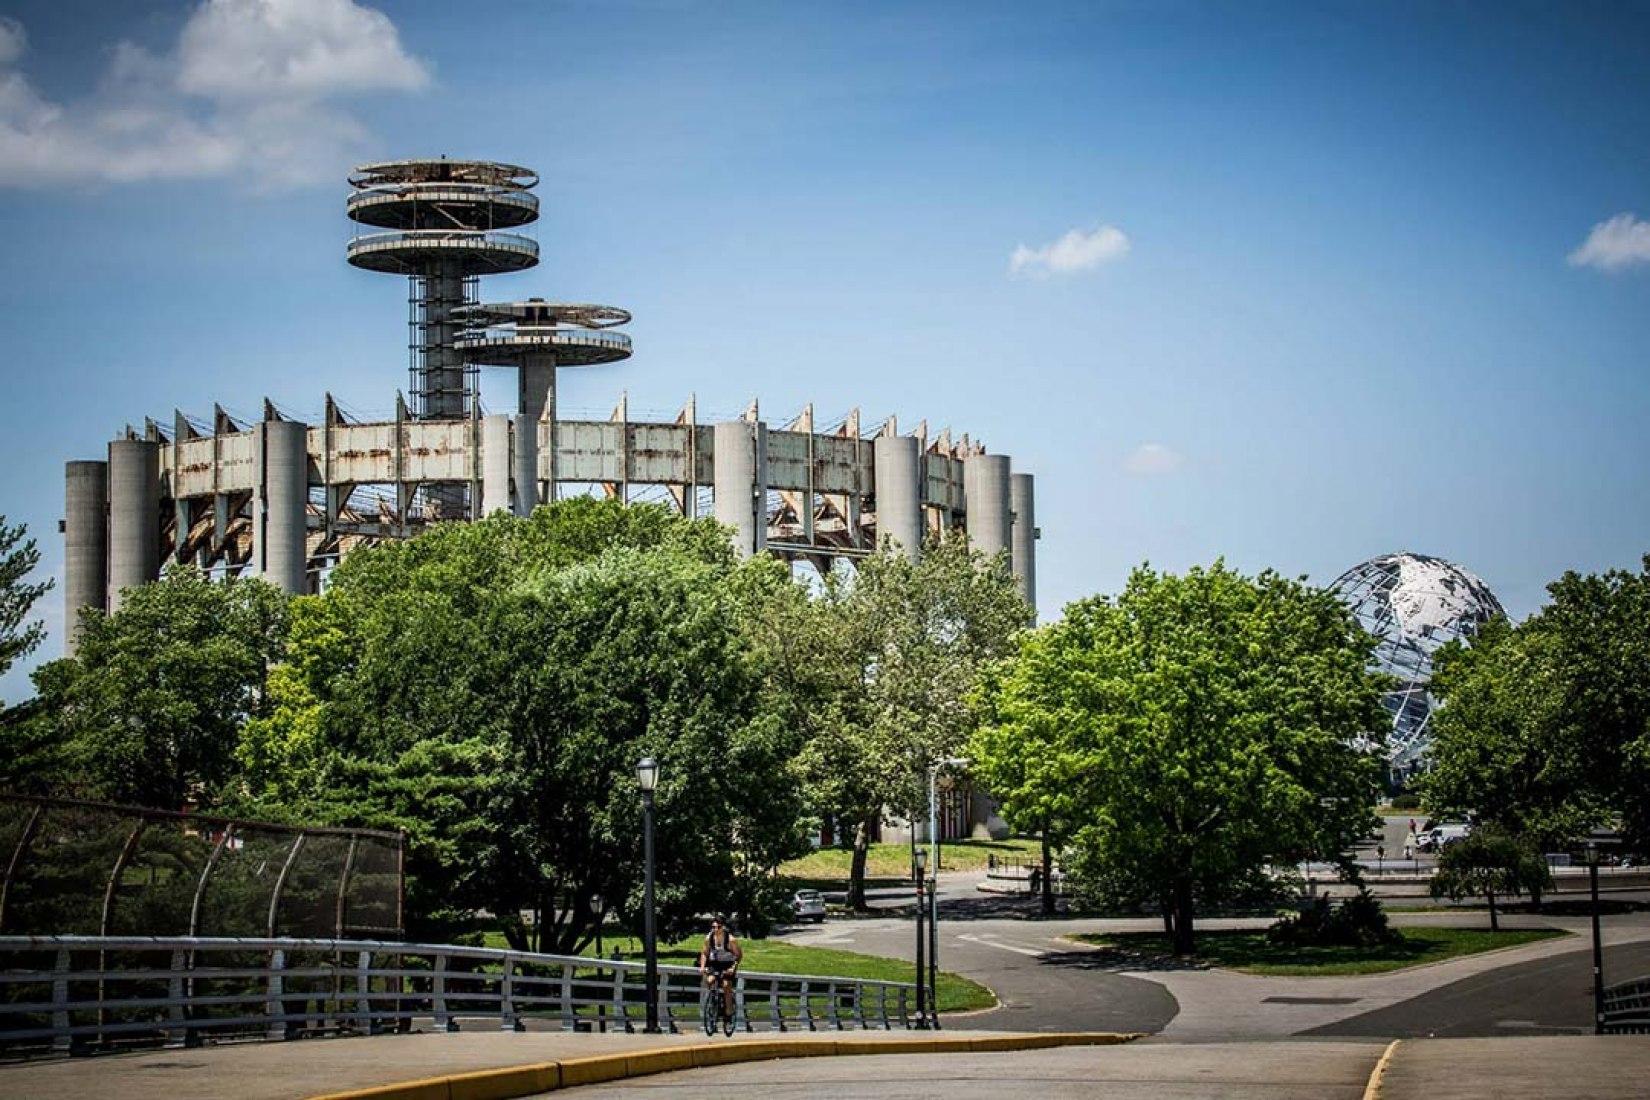 New York World's Fair Pavilion in the present day. Image via Silva's Kickstarter.